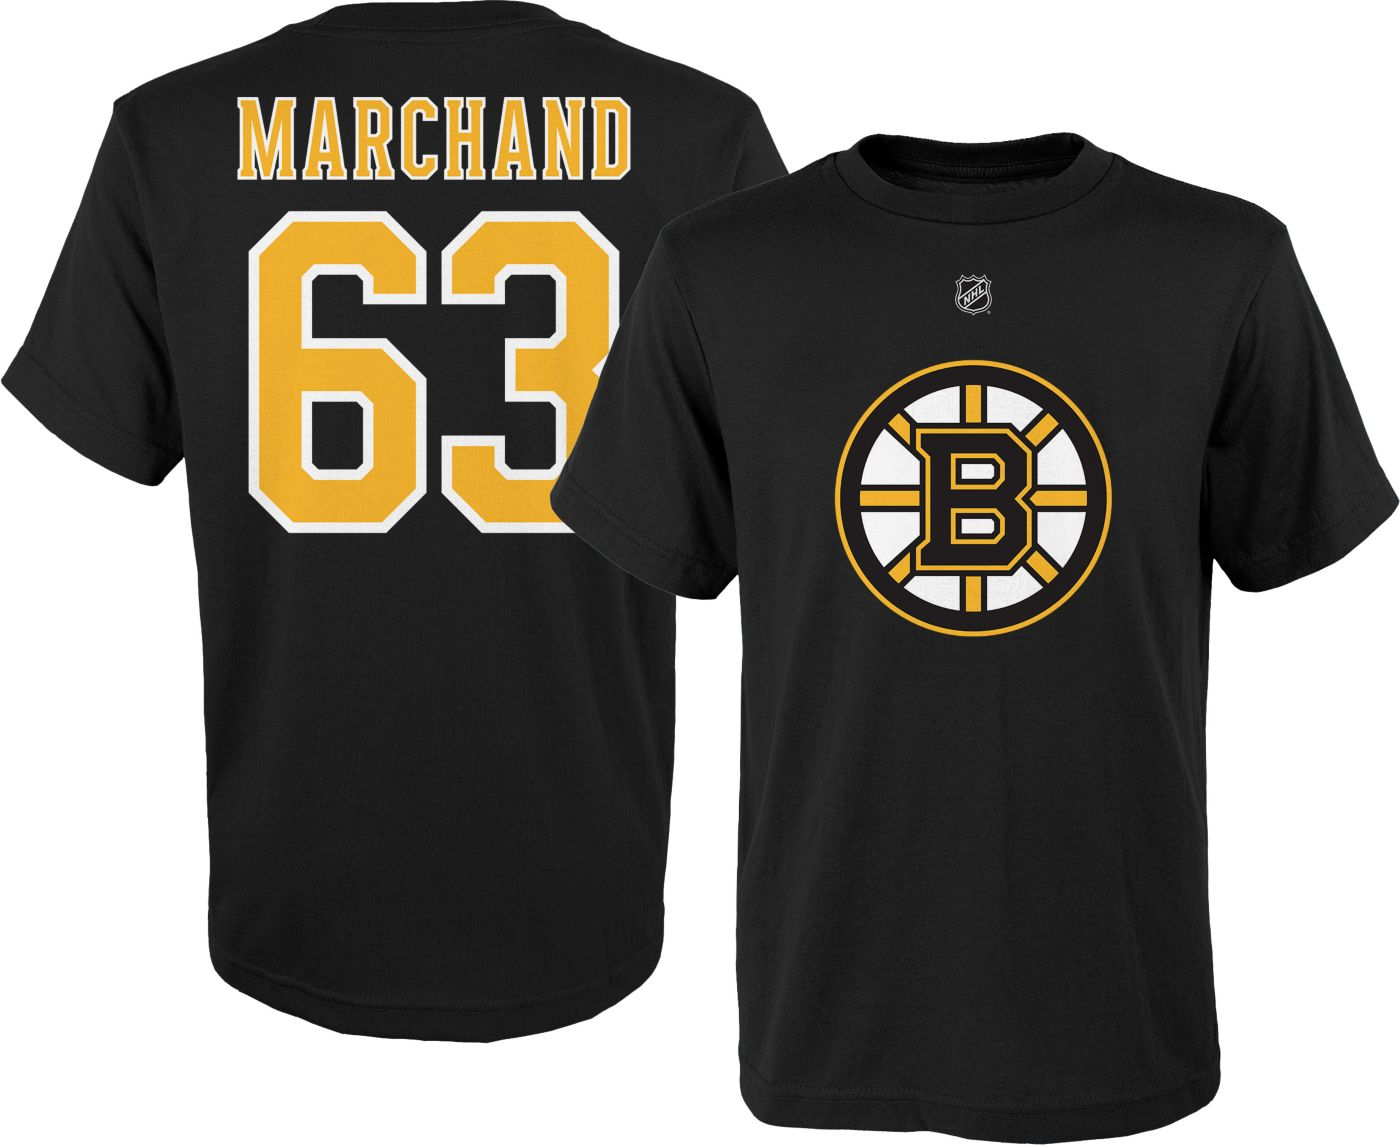 NHL Youth Boston Bruins Brad Marchand #63 Black Tee